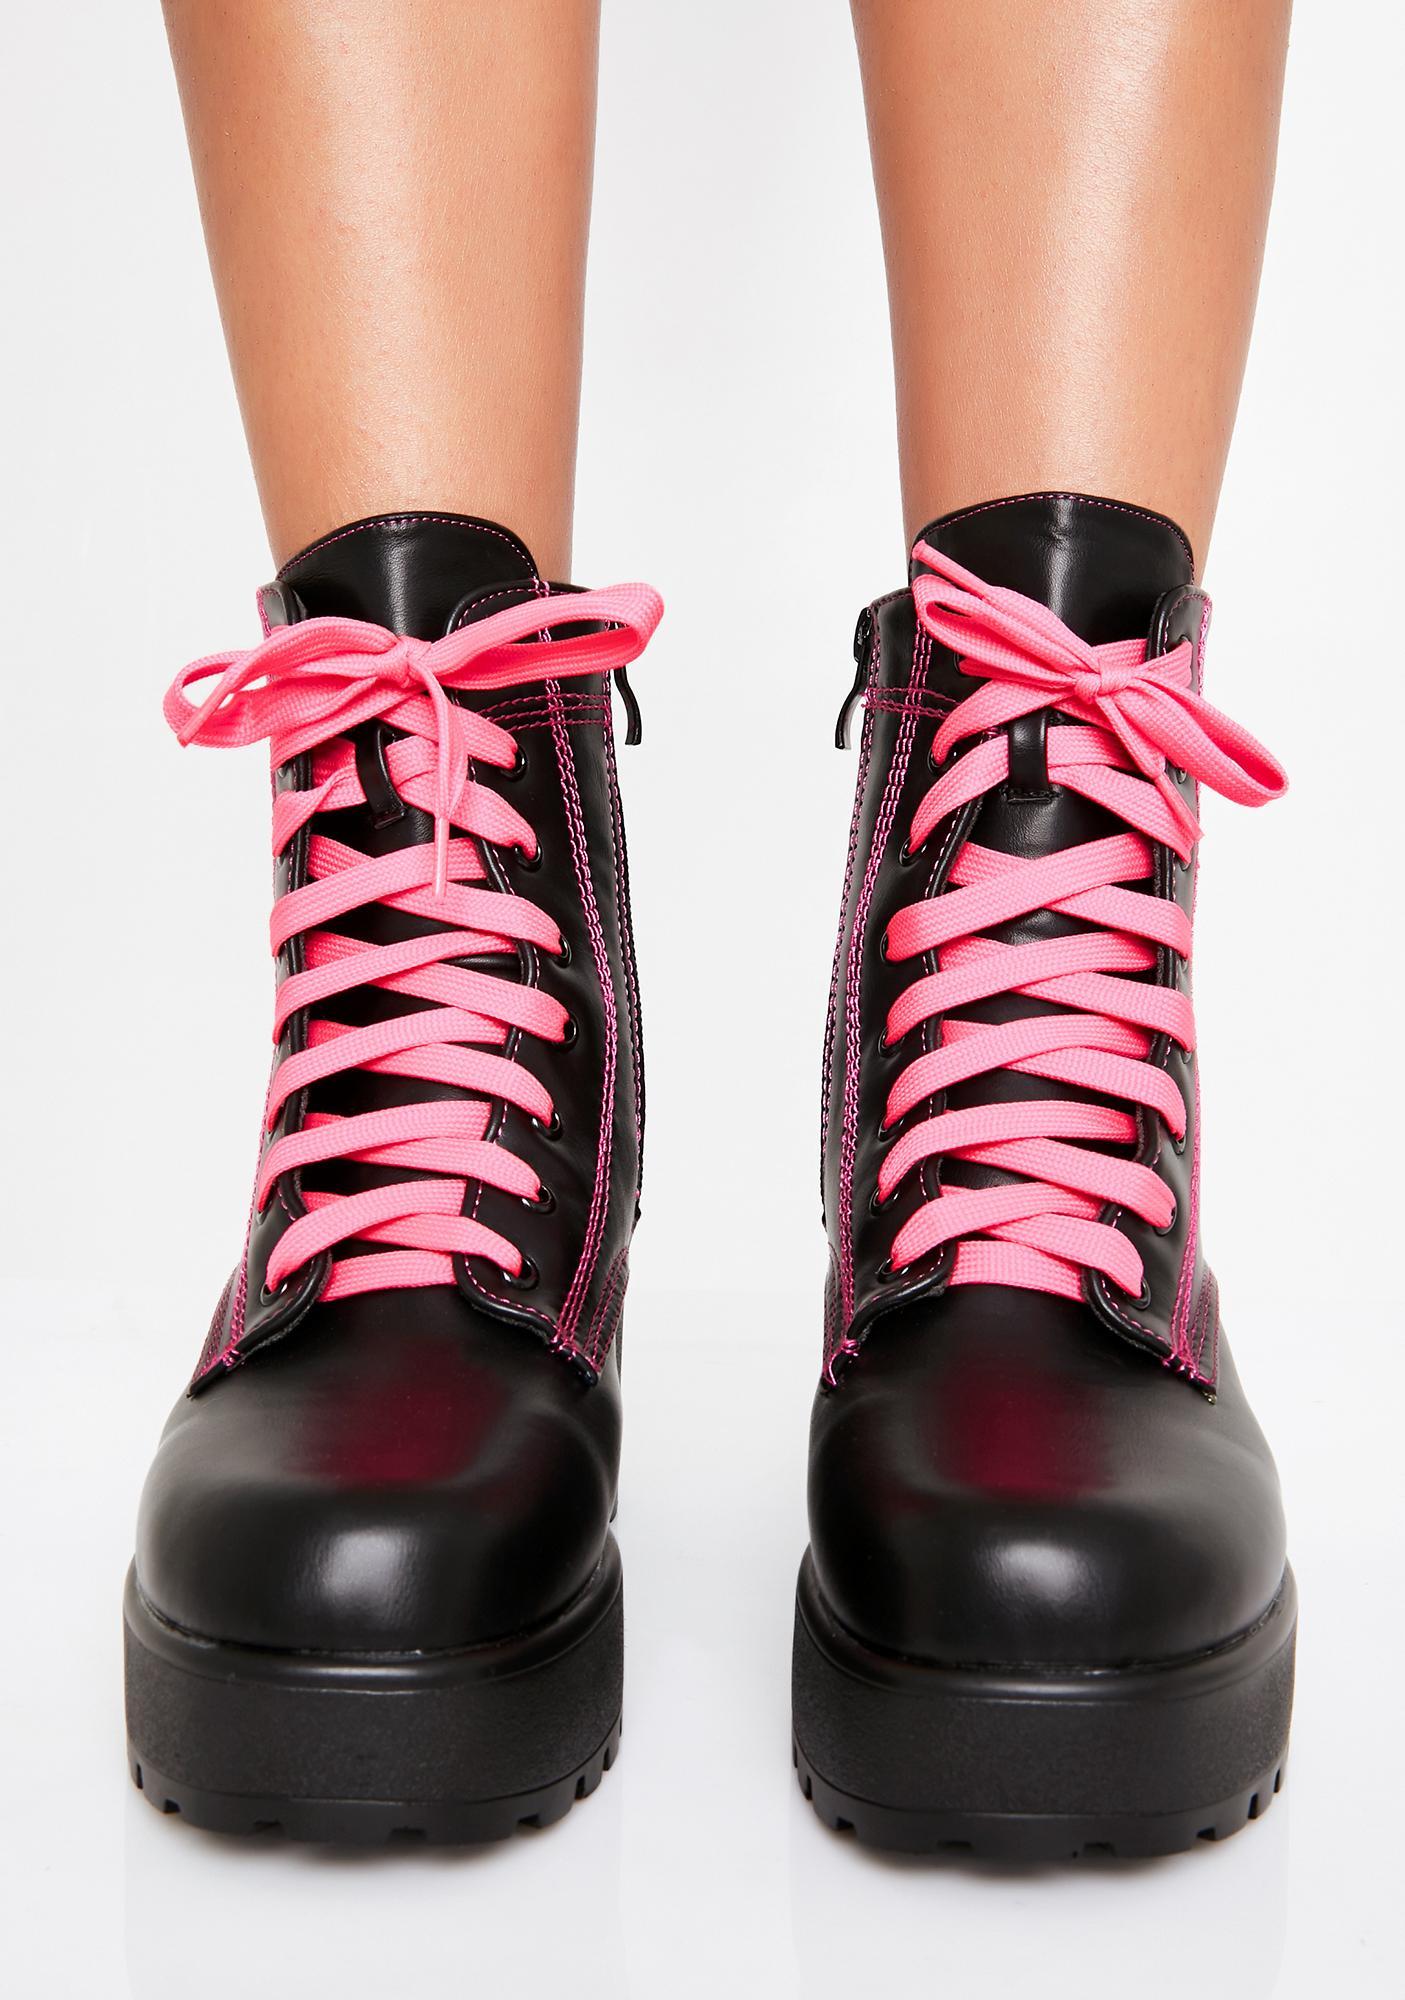 Koi Footwear Candy Kitana Combat Boots